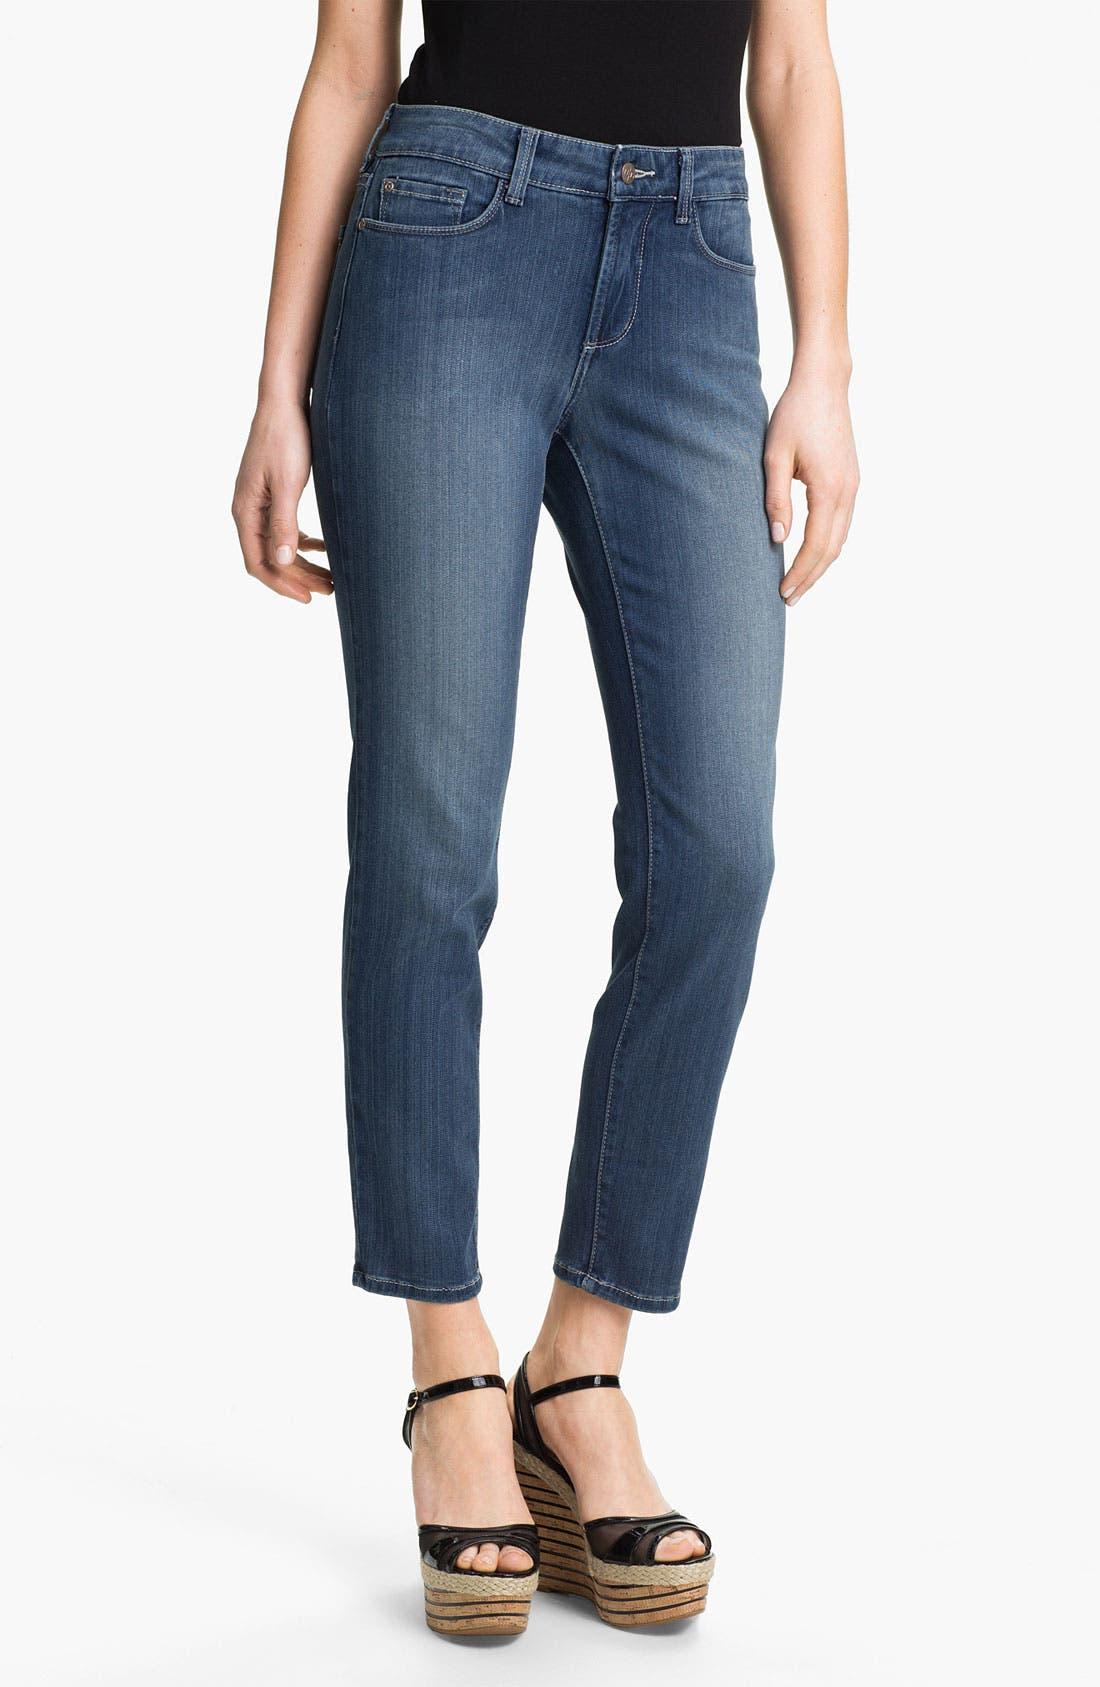 Main Image - NYDJ 'Alina' Stretch Skinny Jeans (Petite)